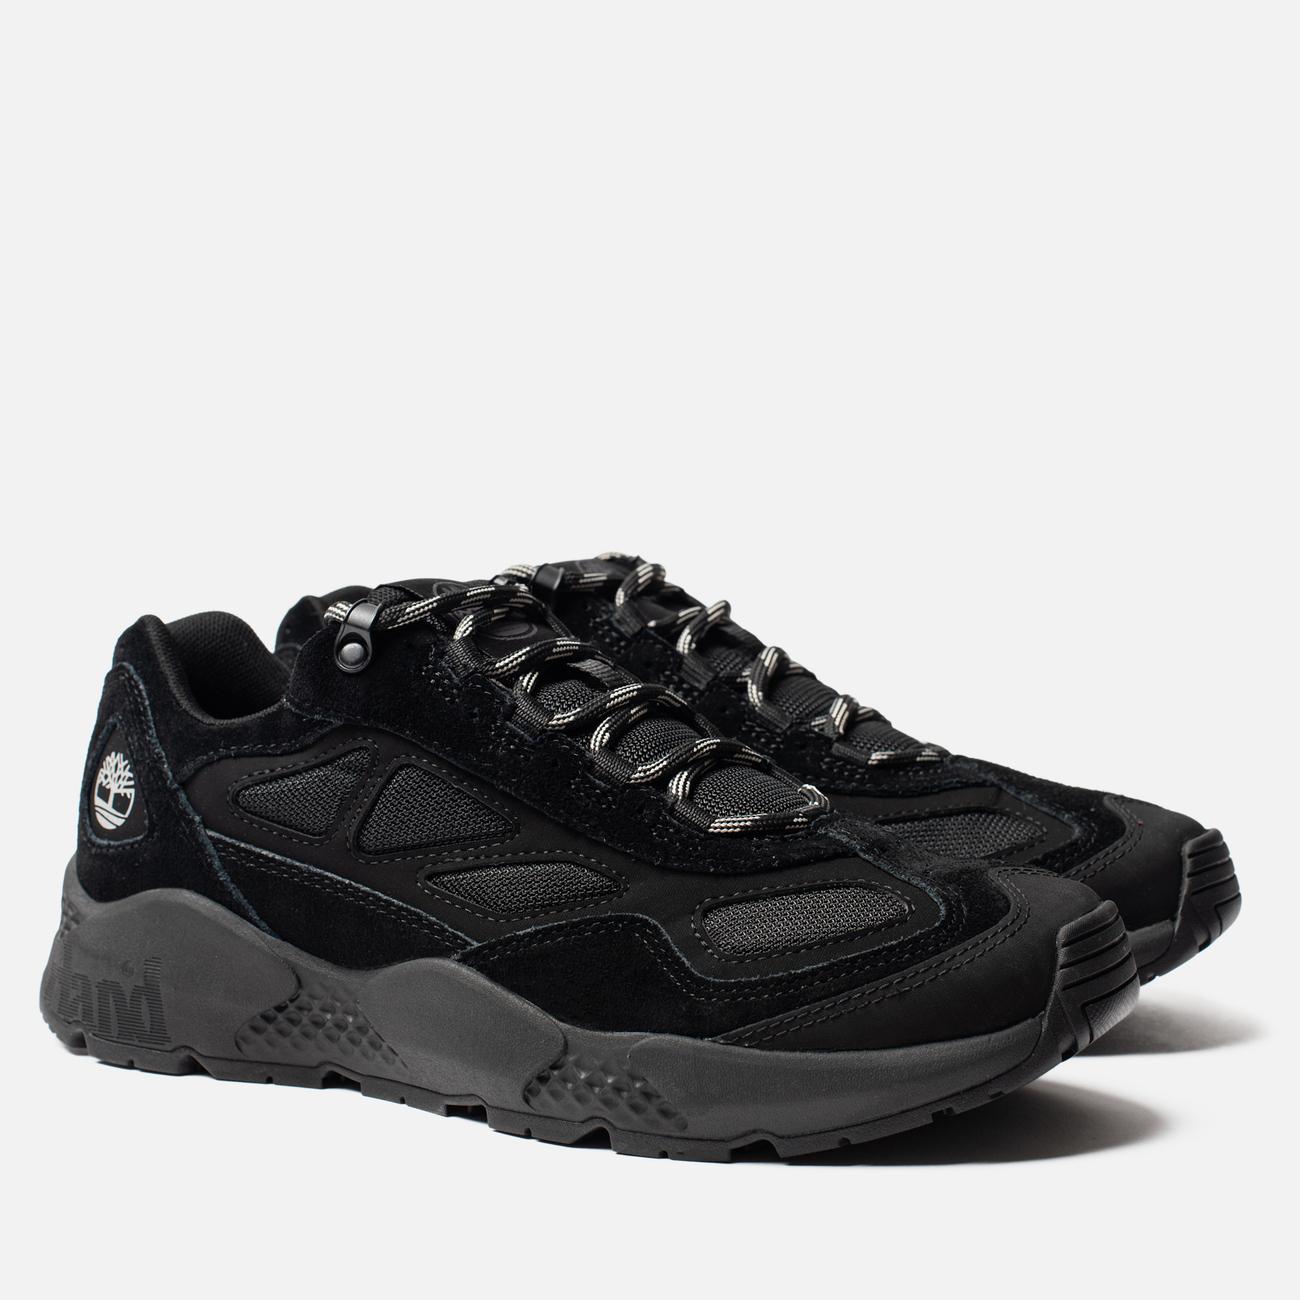 Мужские кроссовки Timberland Ripcord Low Hiker Black